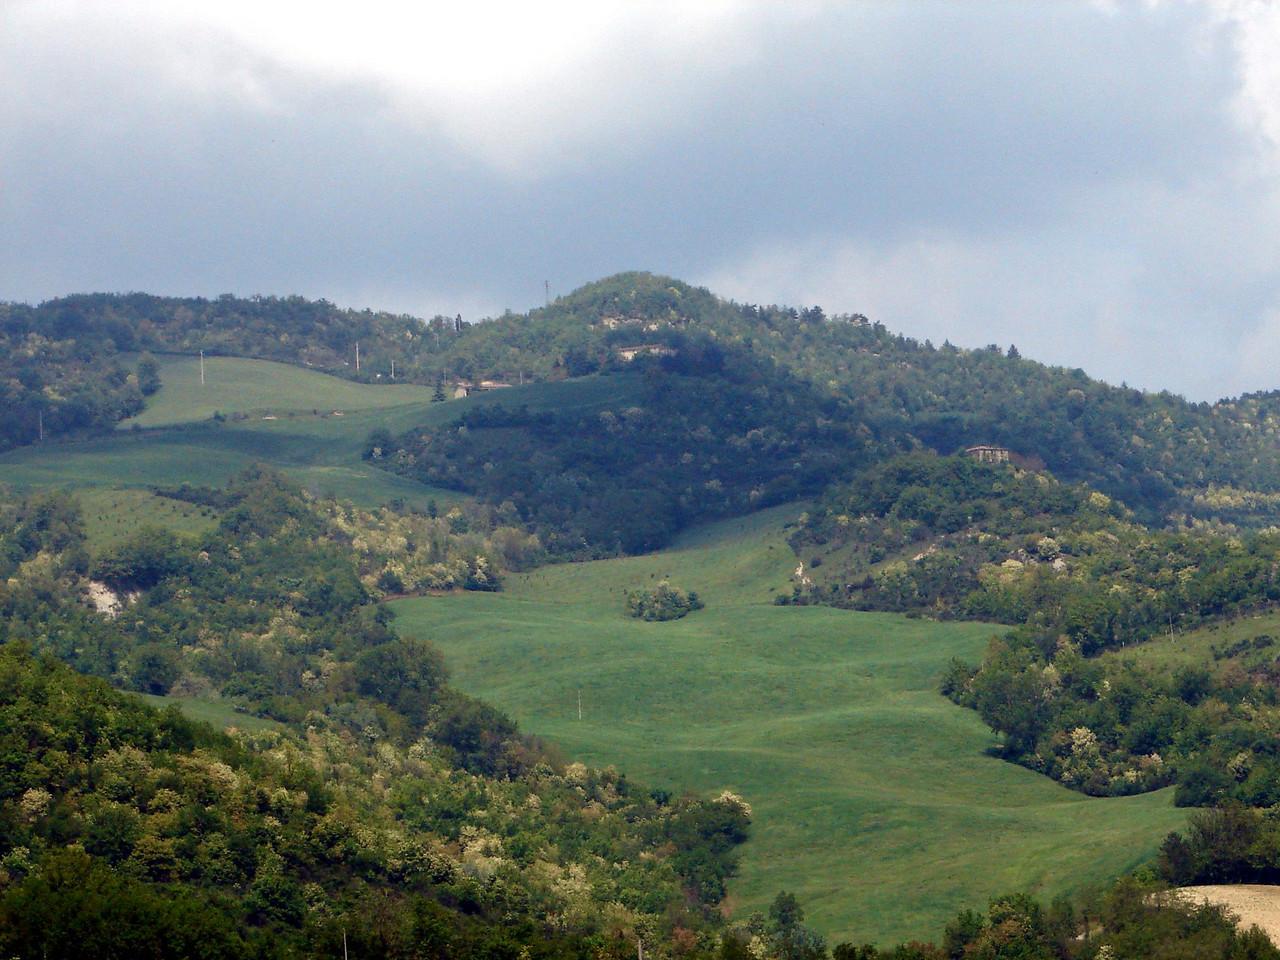 #67 Florence to Forli